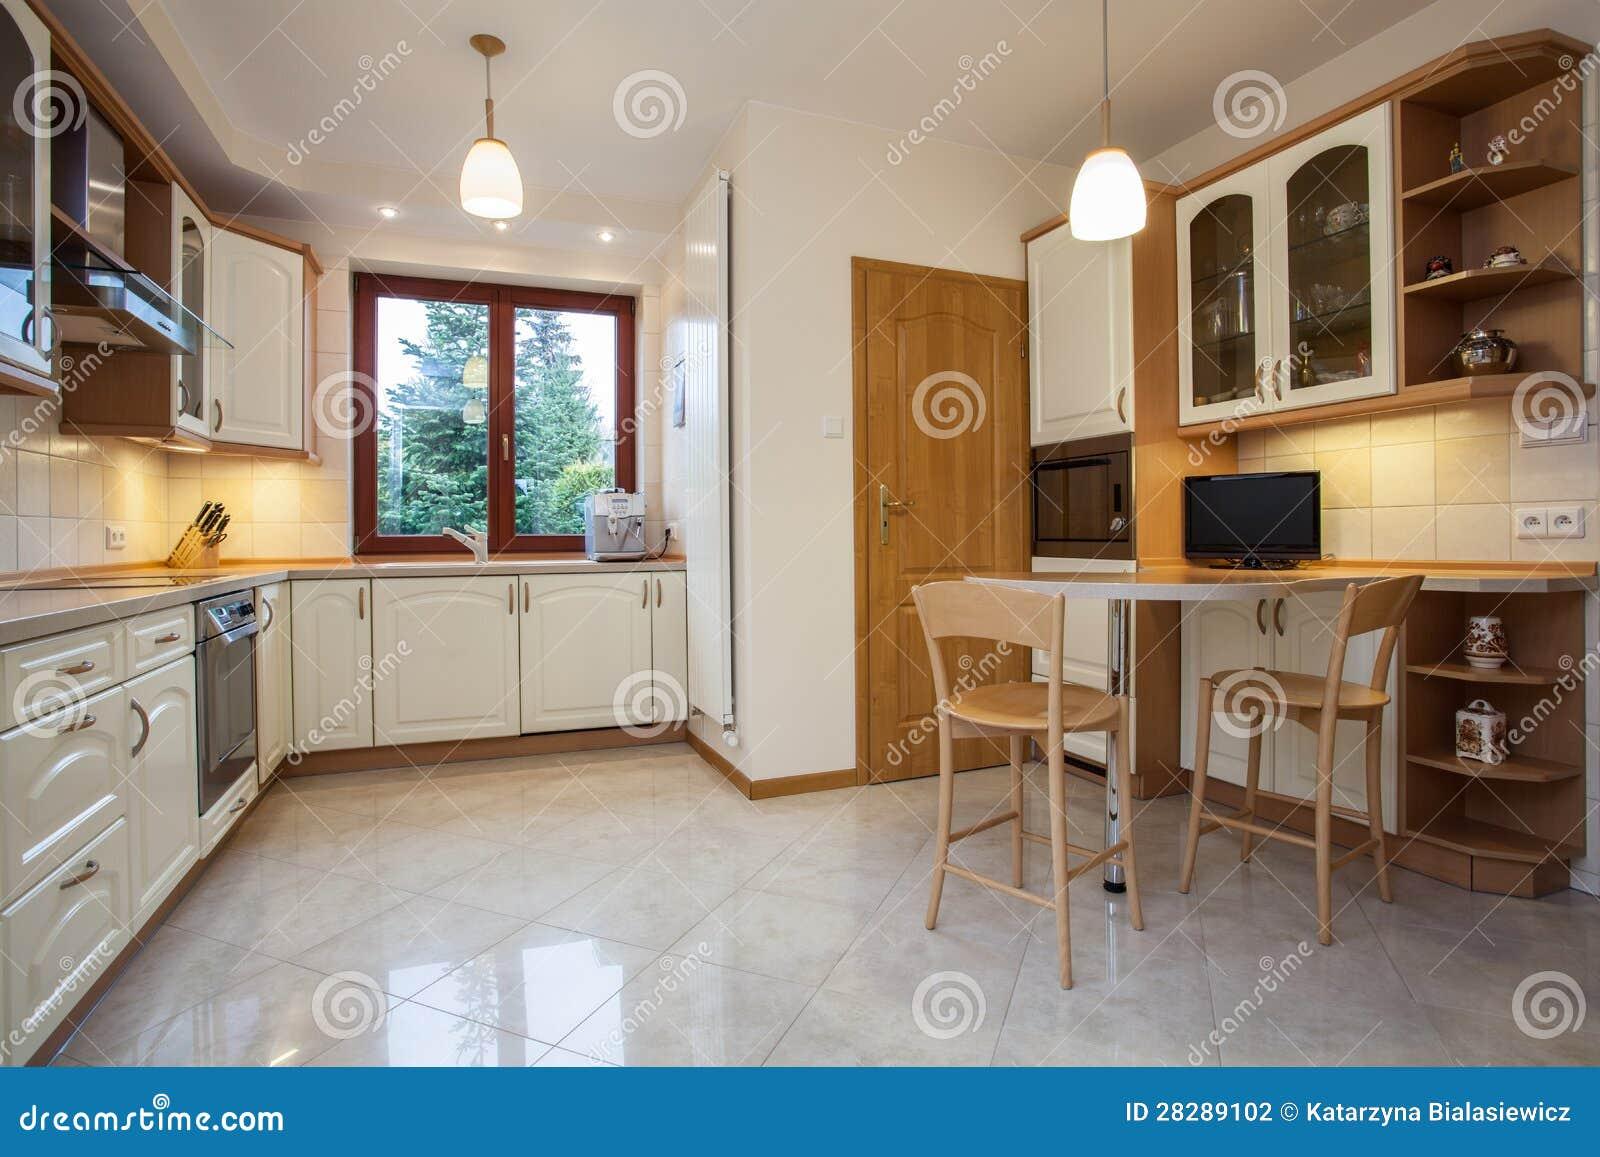 Tv In Keuken : Prachtige moderne keuken met tv u stockvideo paha l